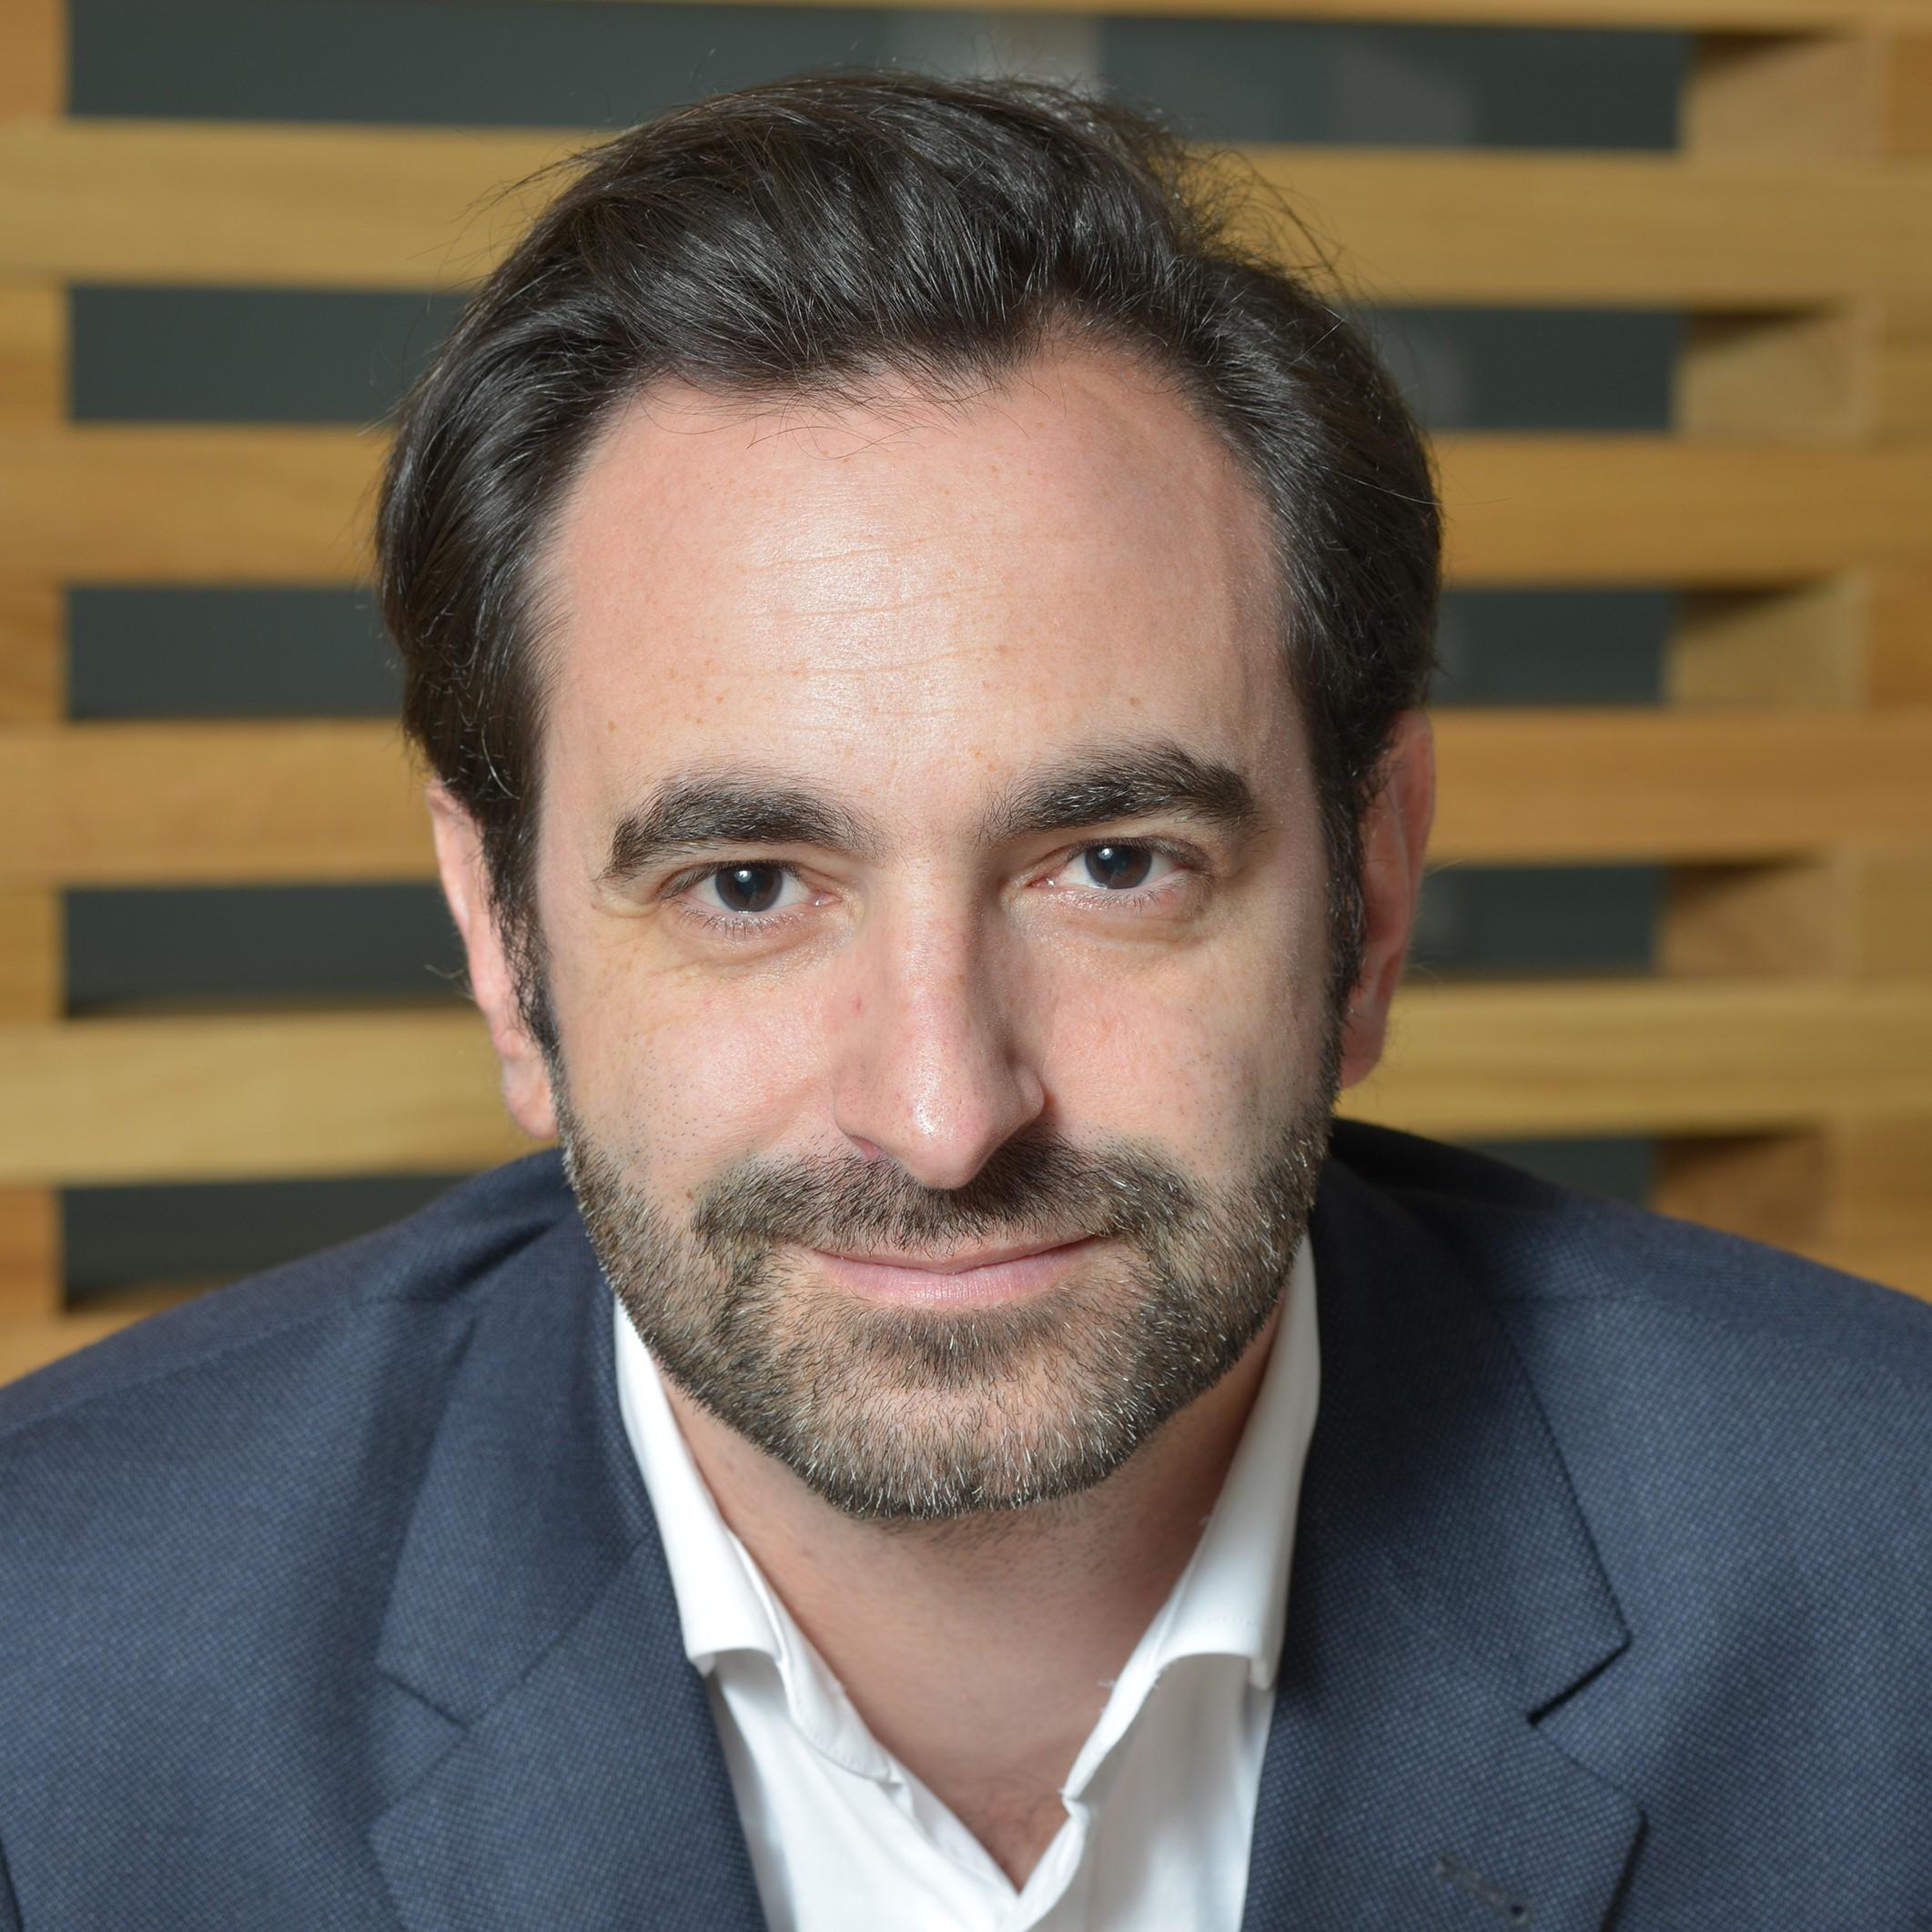 Jean-Philippe Poisson